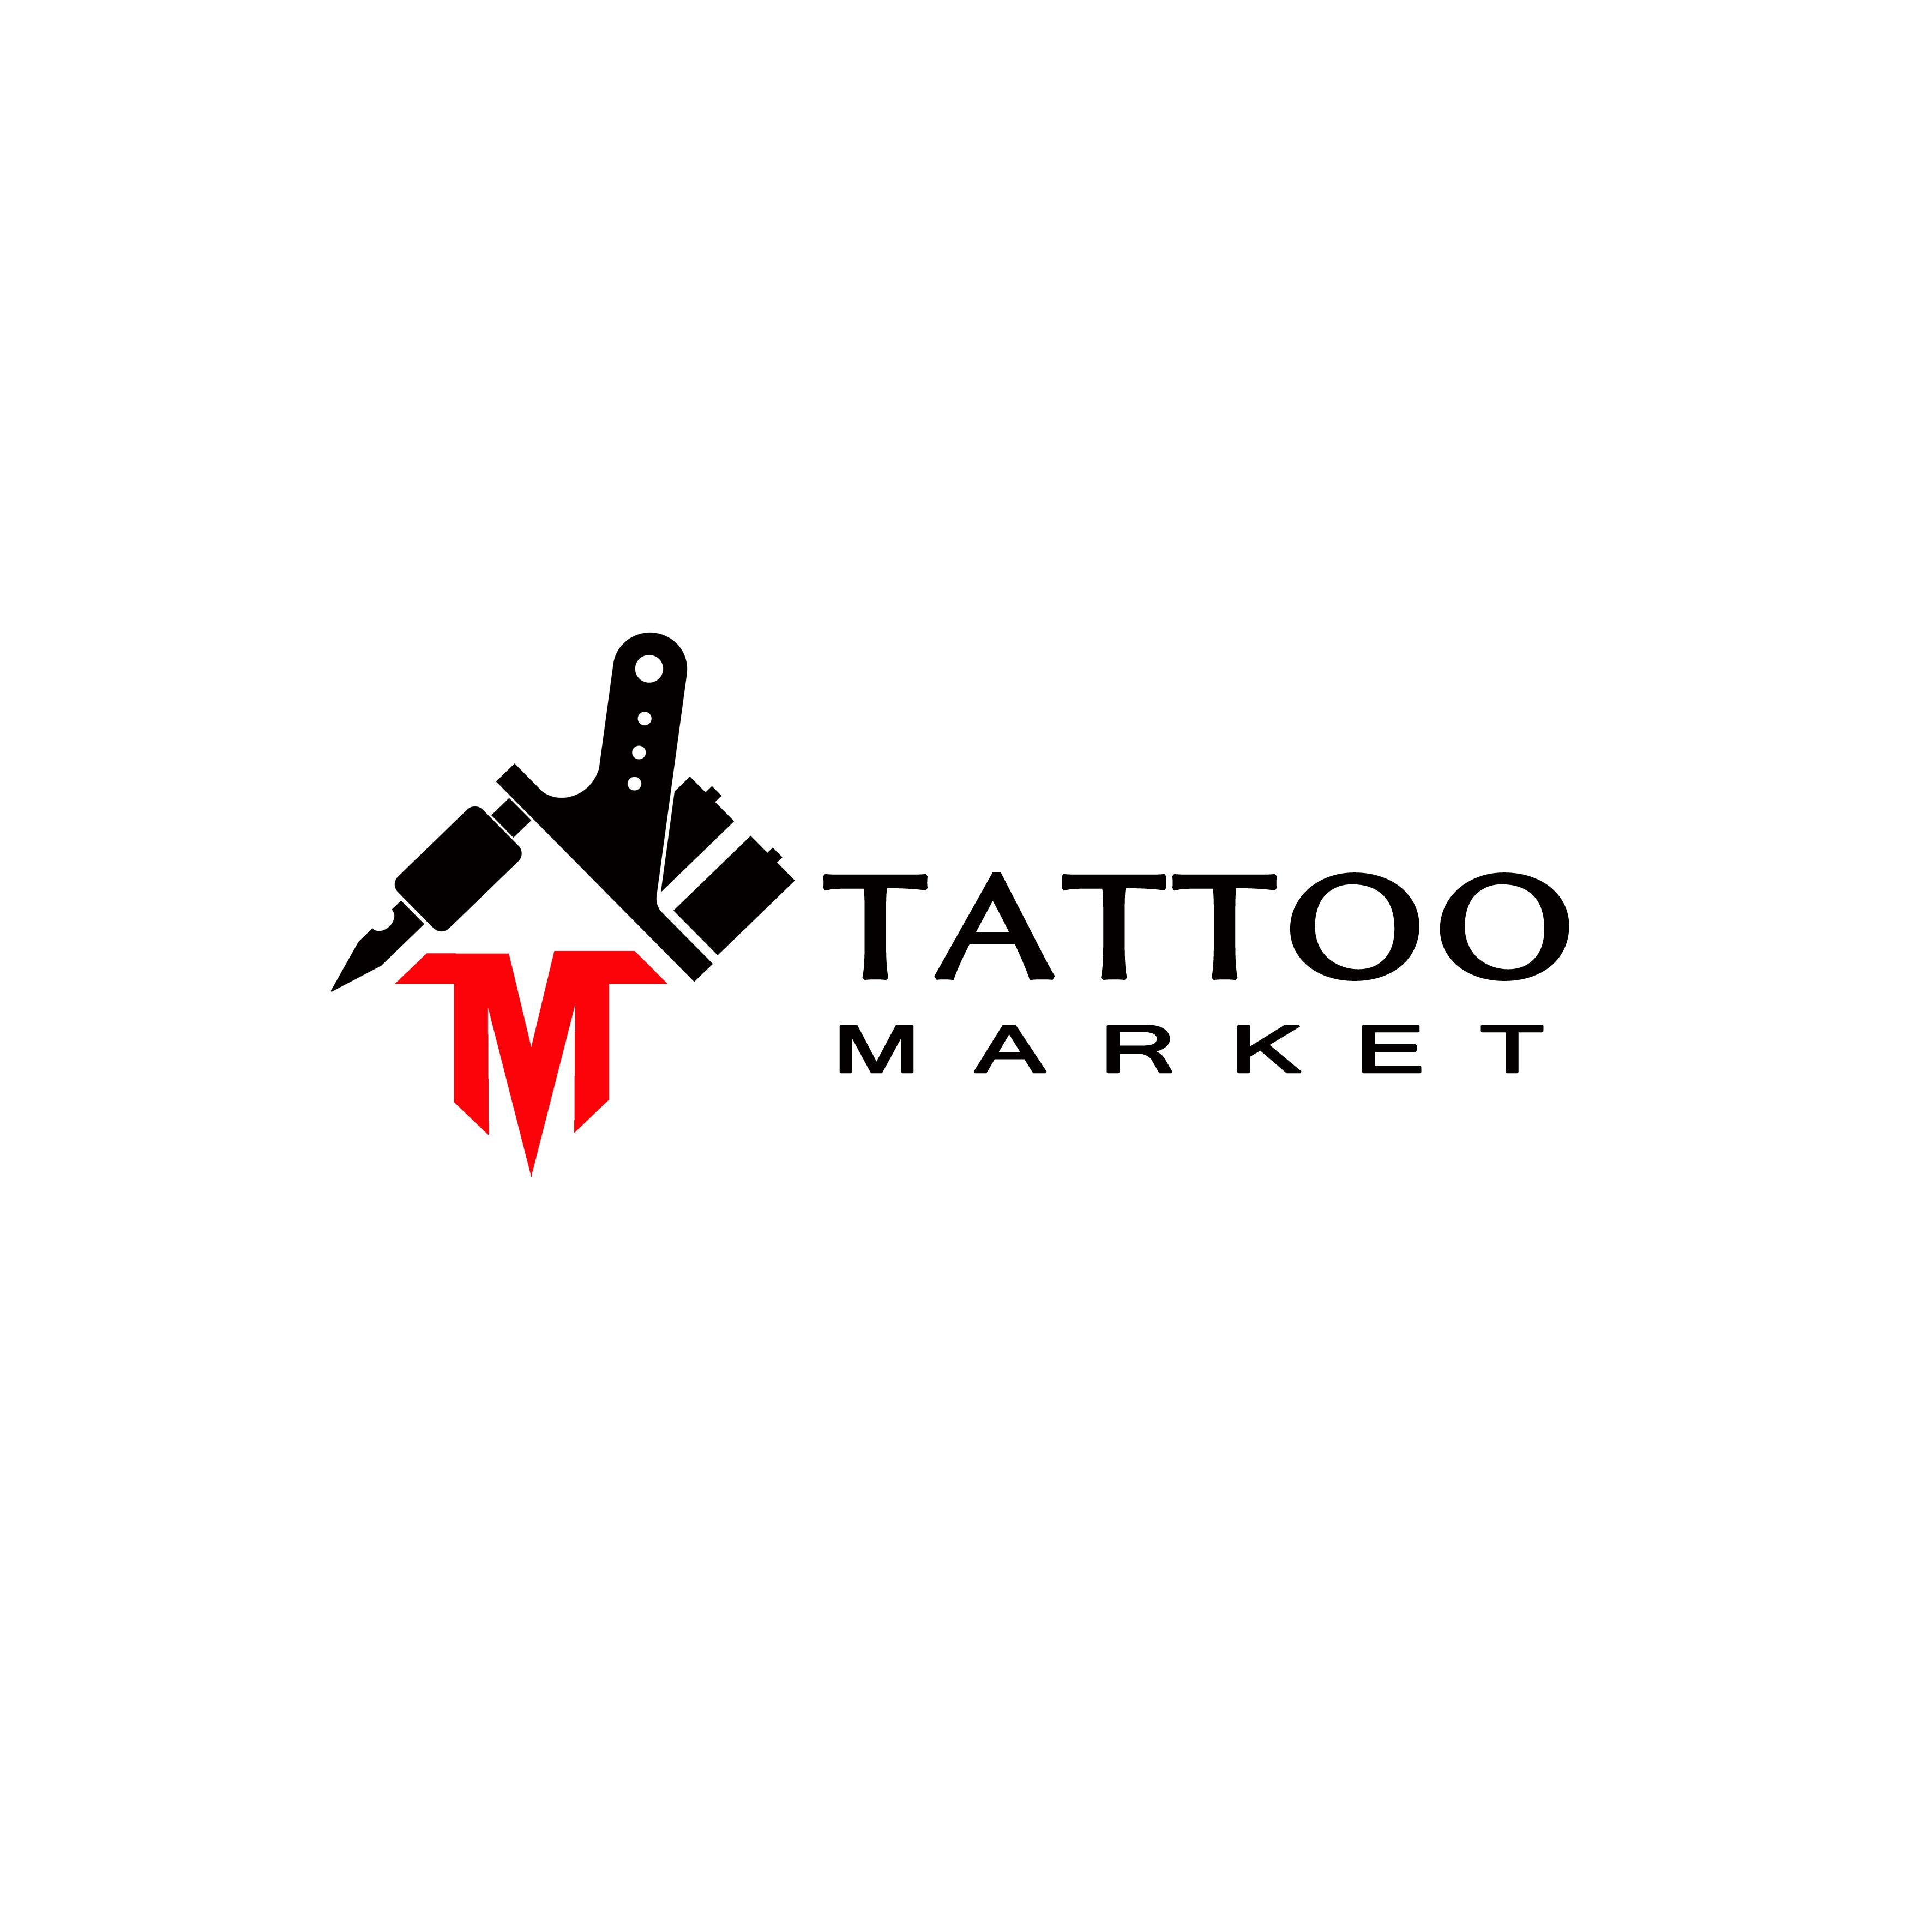 Редизайн логотипа магазина тату оборудования TattooMarket.ru фото f_4465c40b71ecb611.jpg